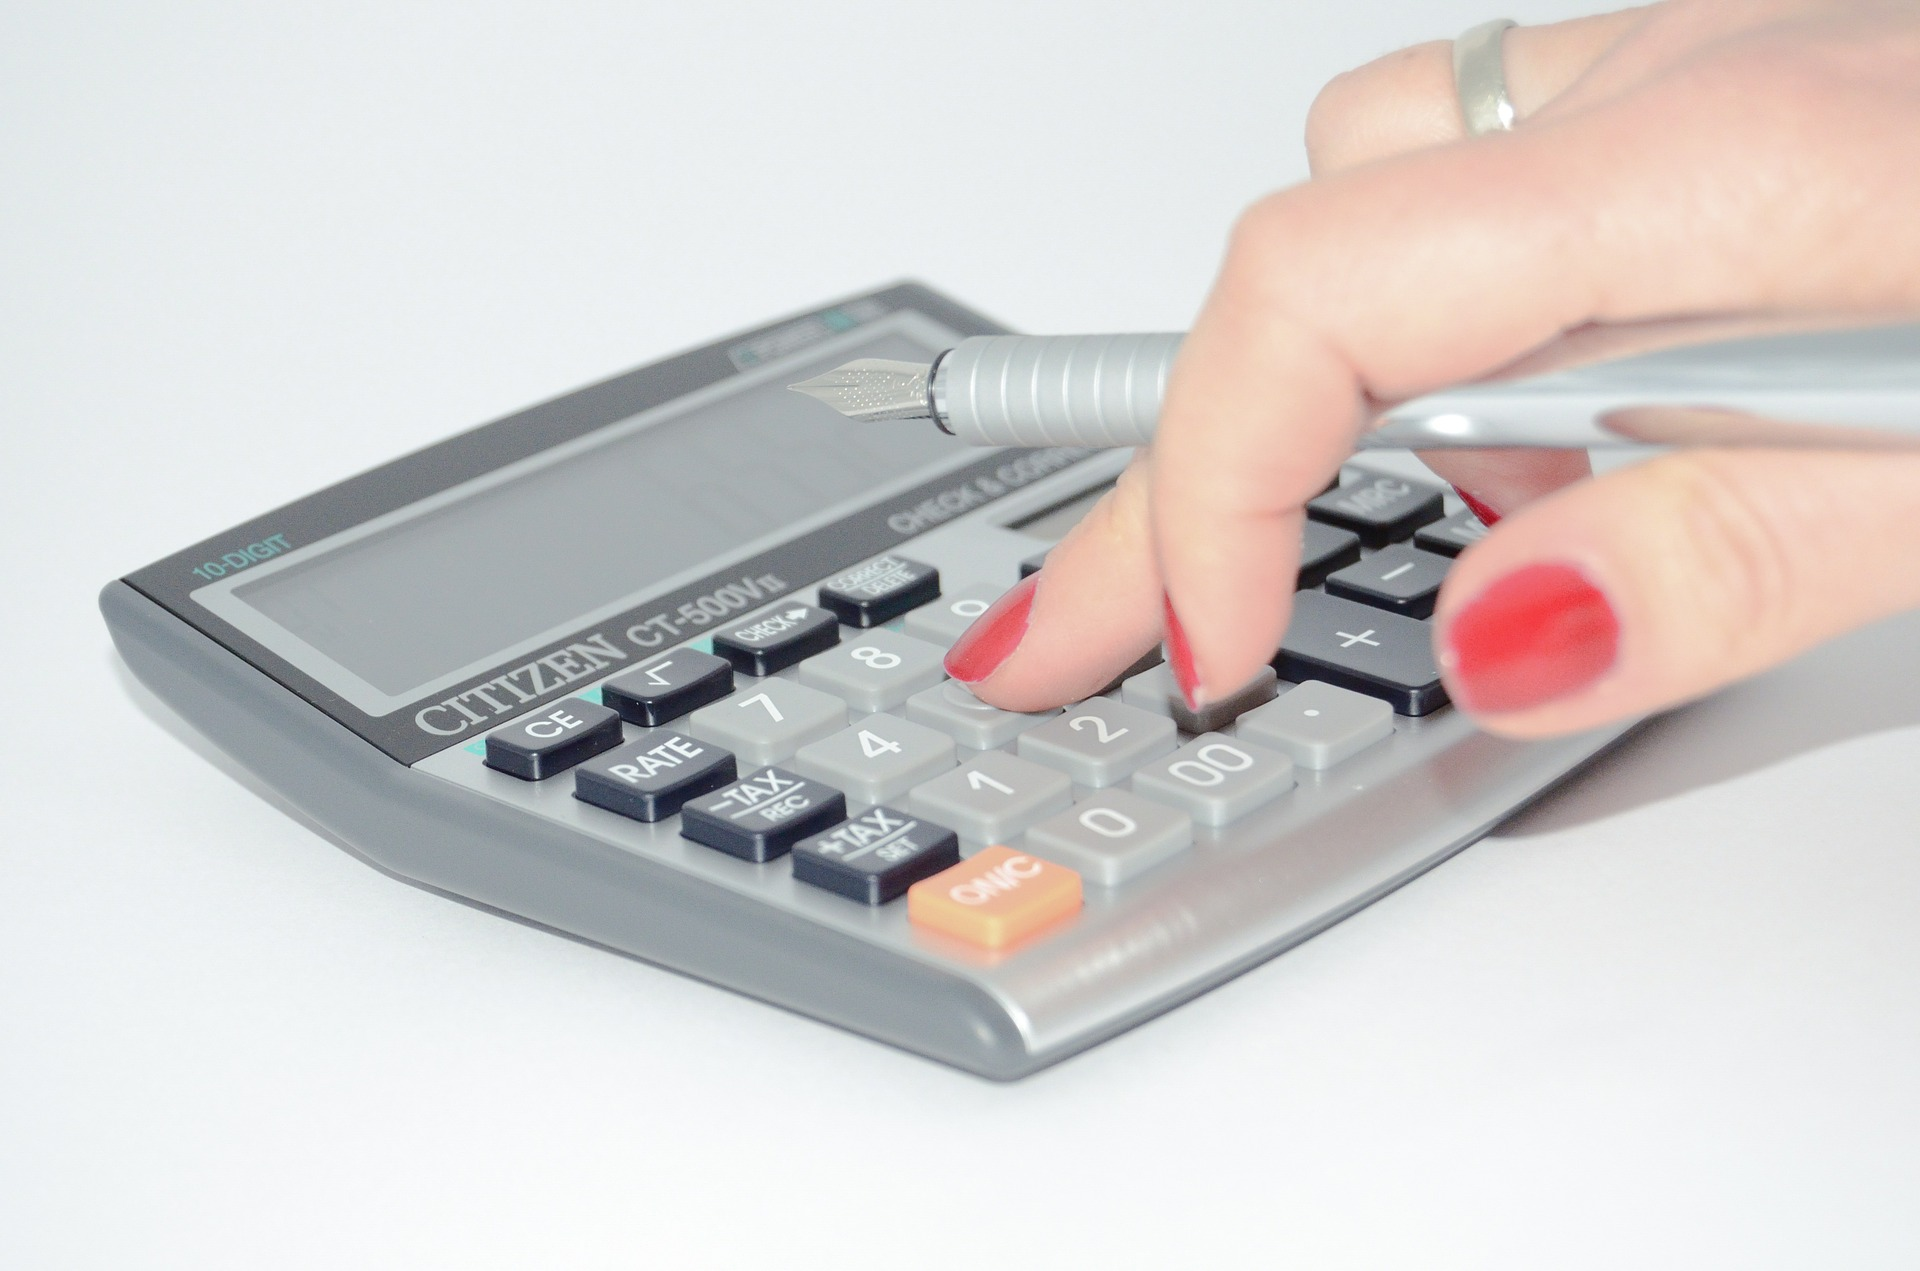 calculadora mano mujer